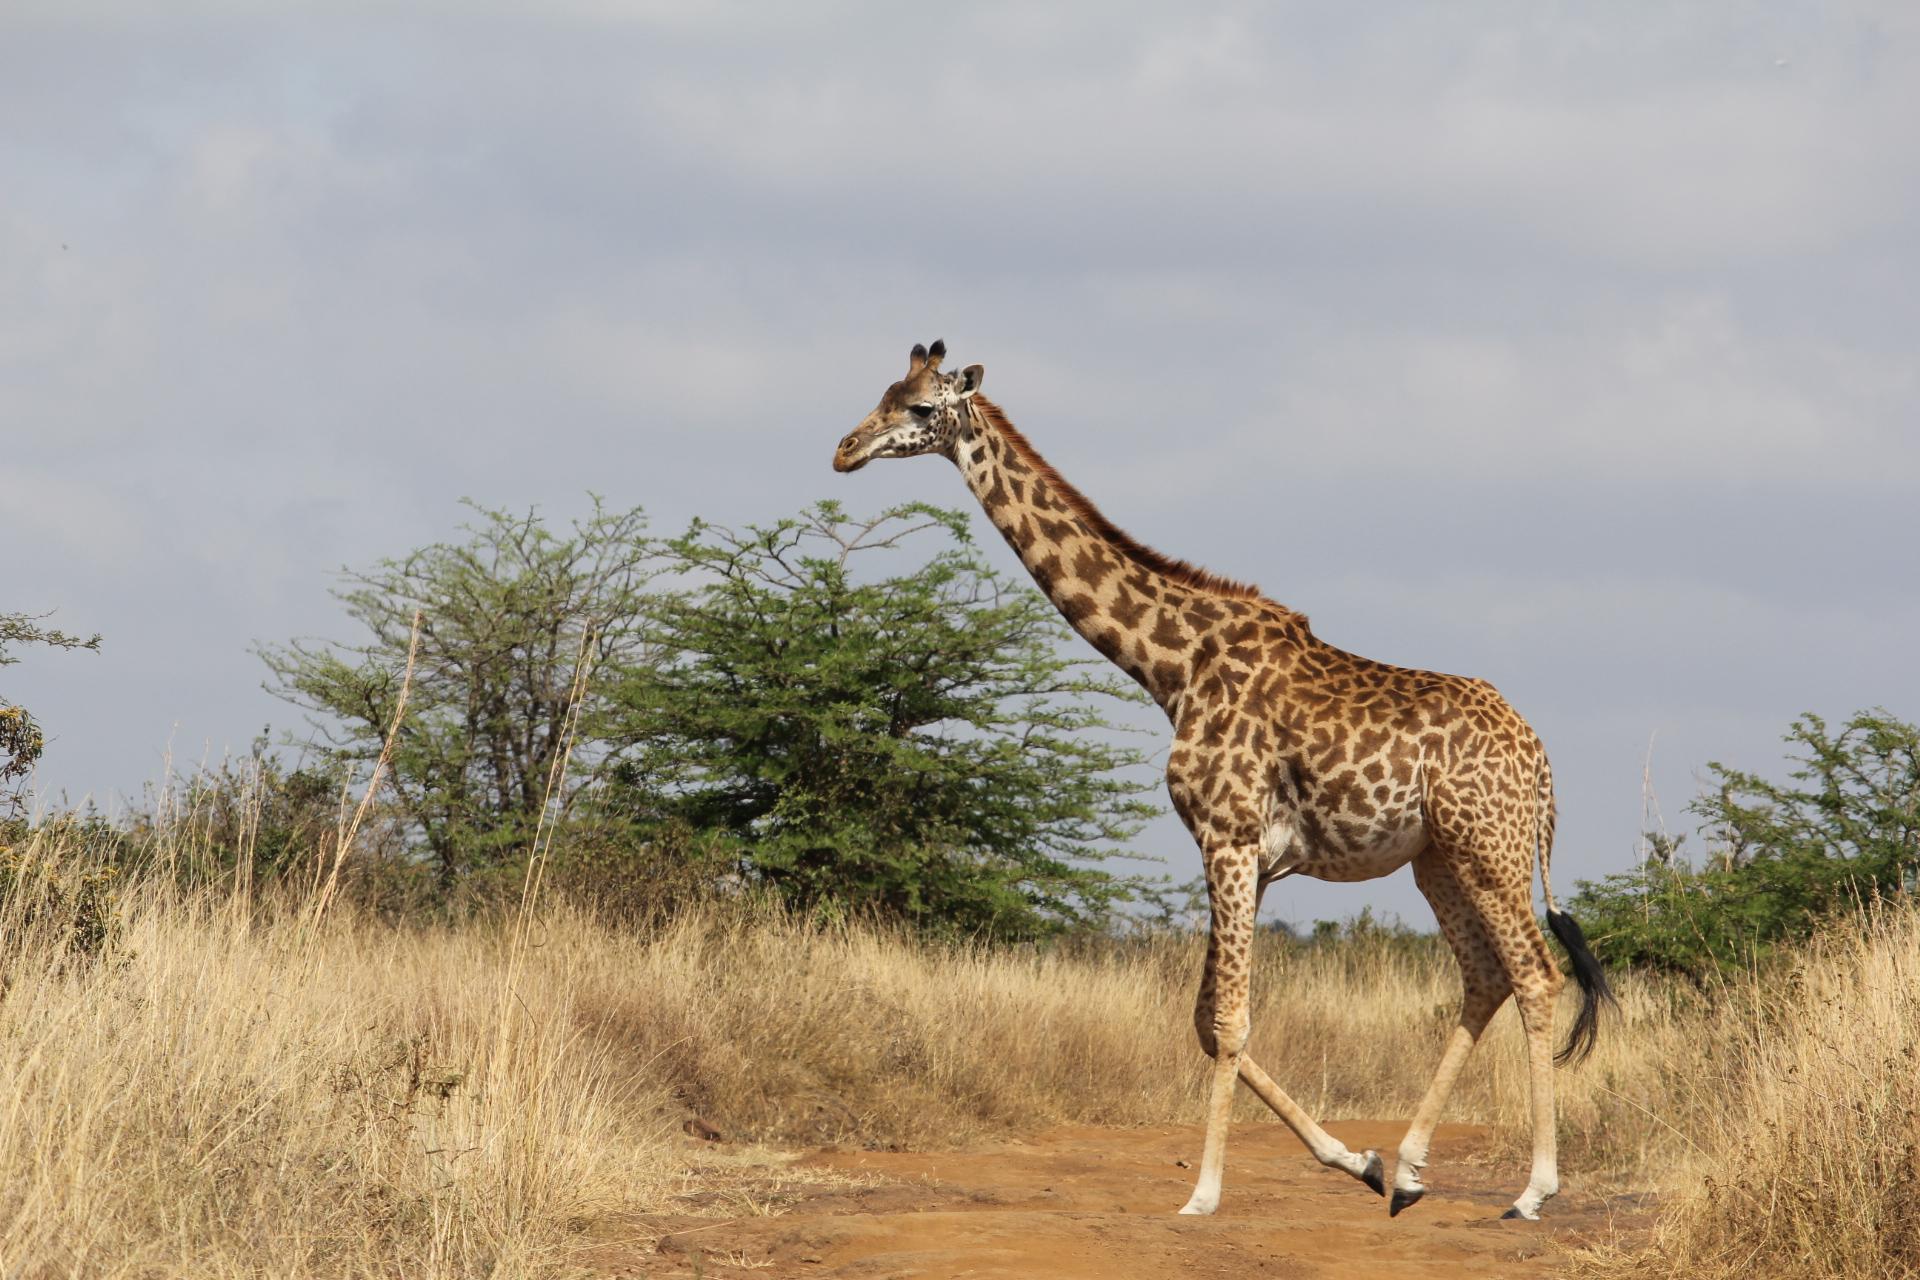 Rothschild Giraffe crossing a path in Nairobi National Park